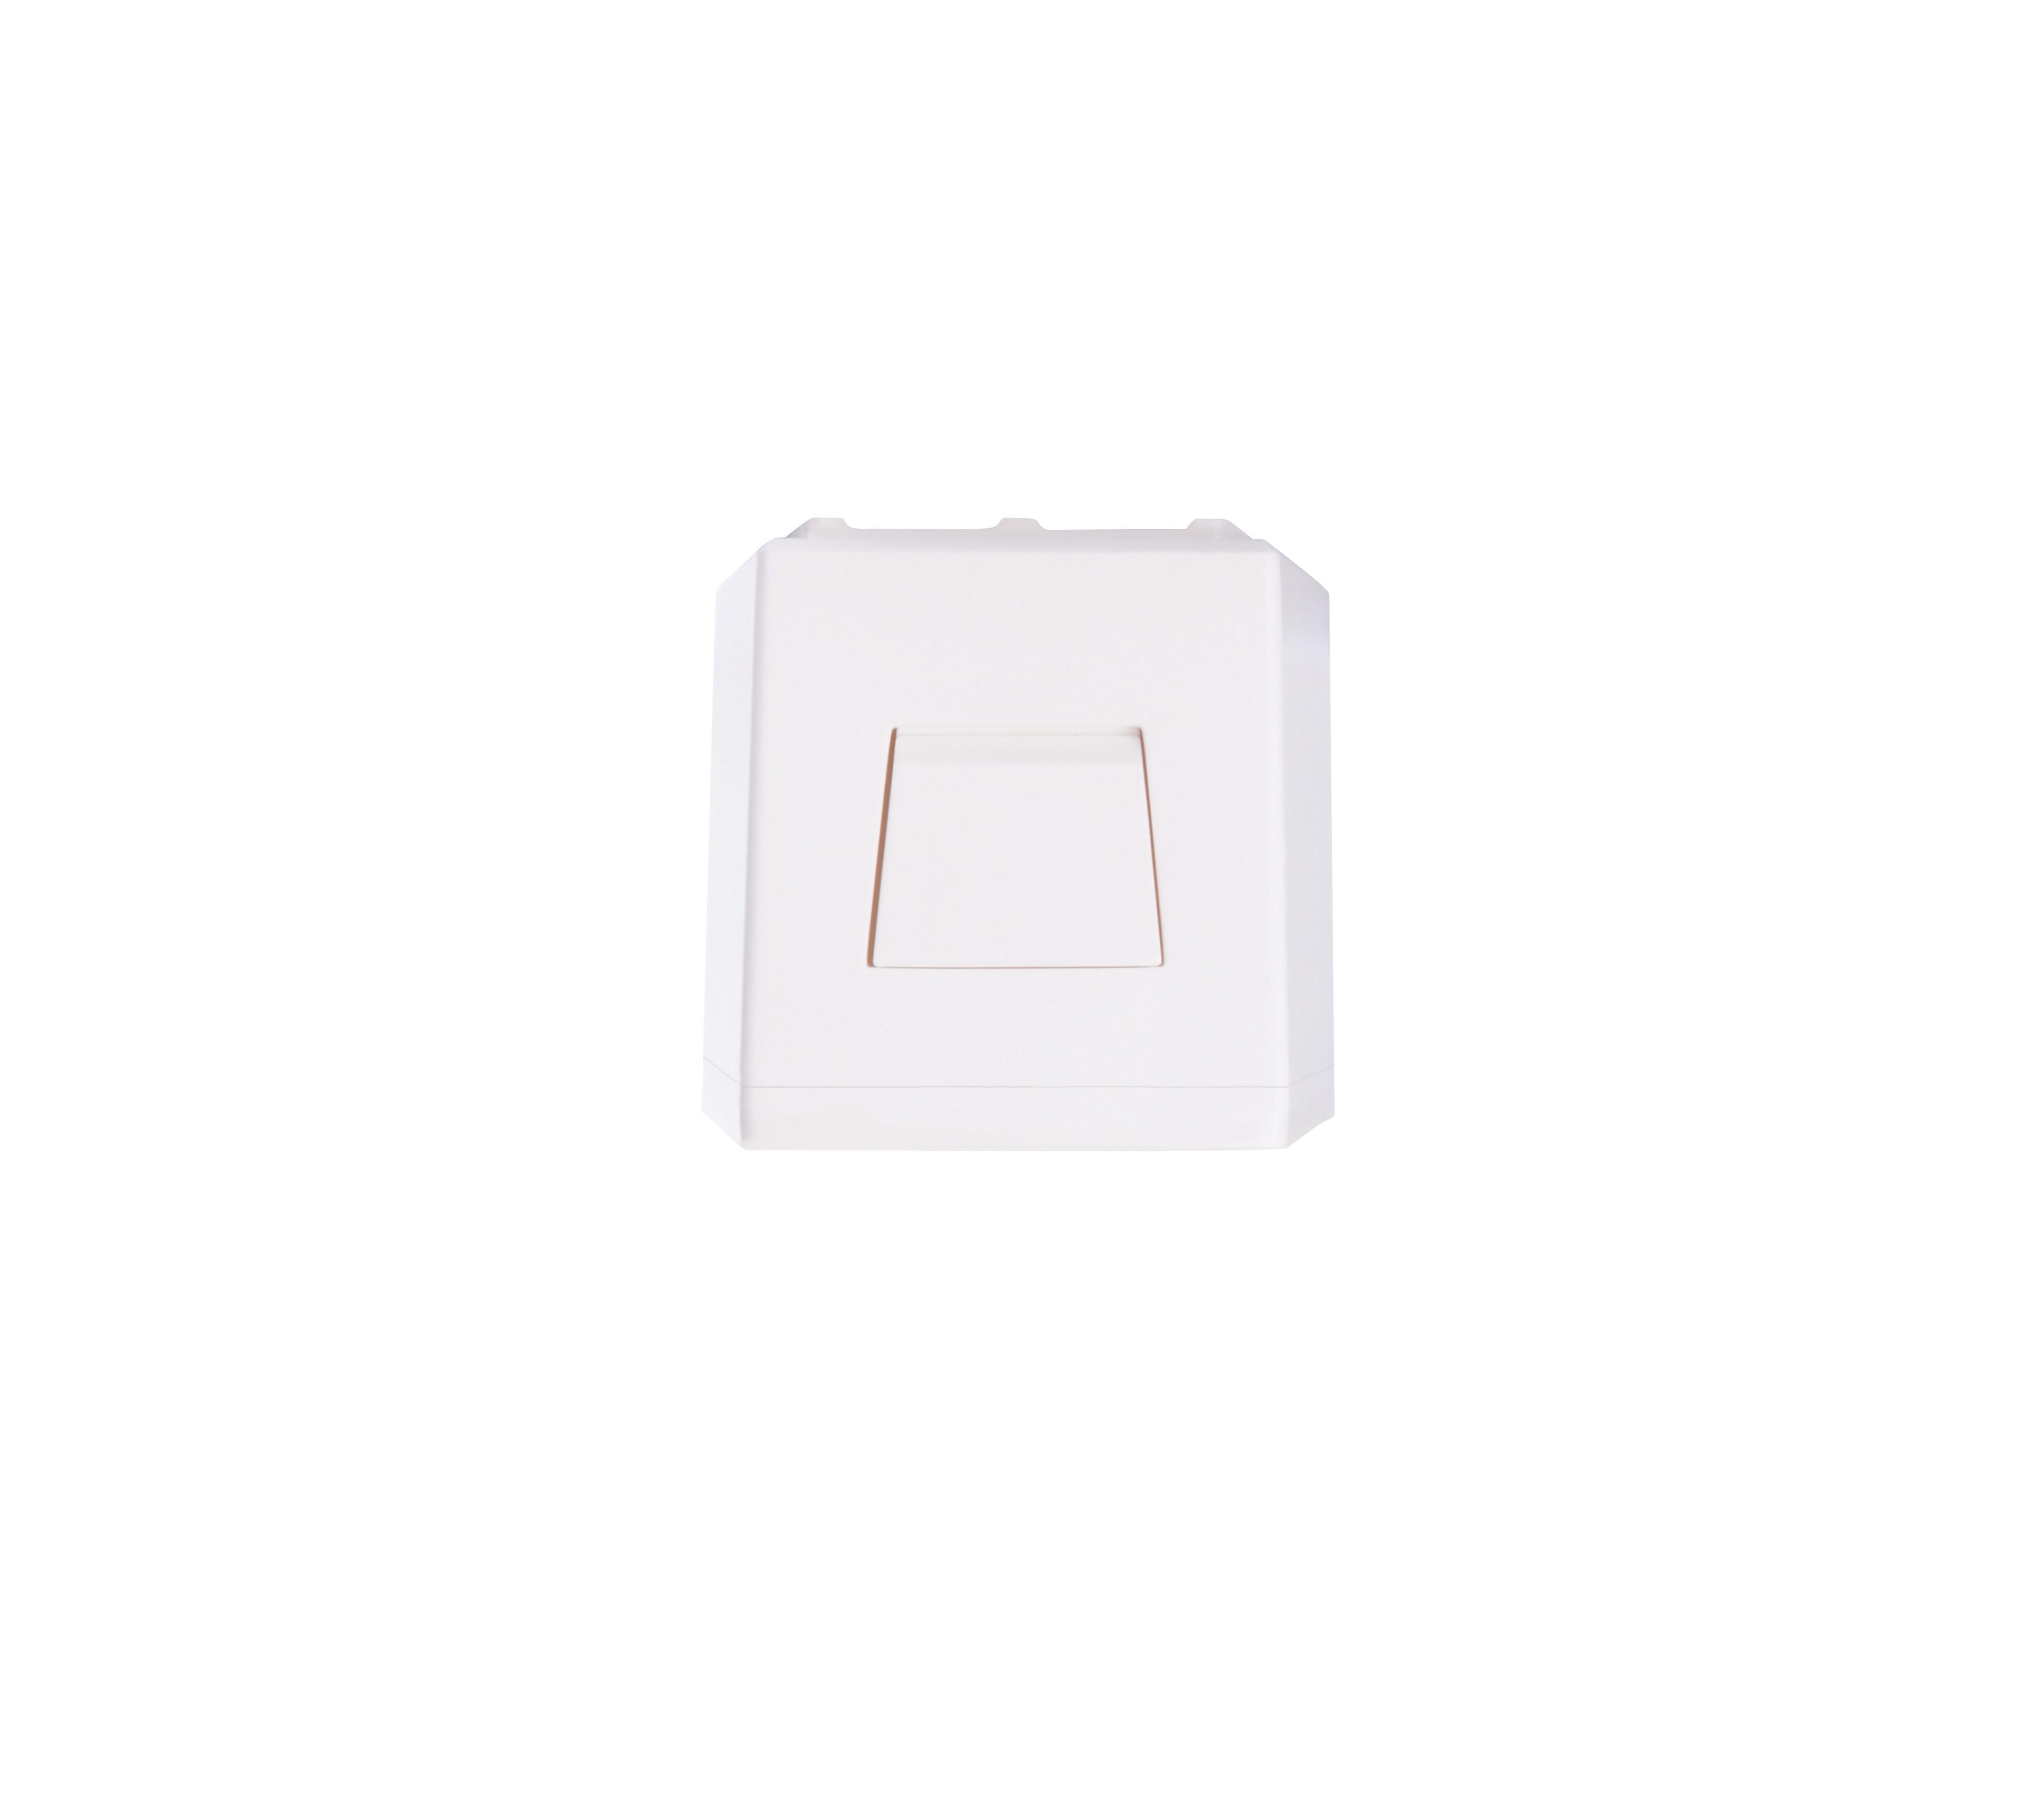 Lampa emergenta led Intelight 94717   3h nementinut test automat 1